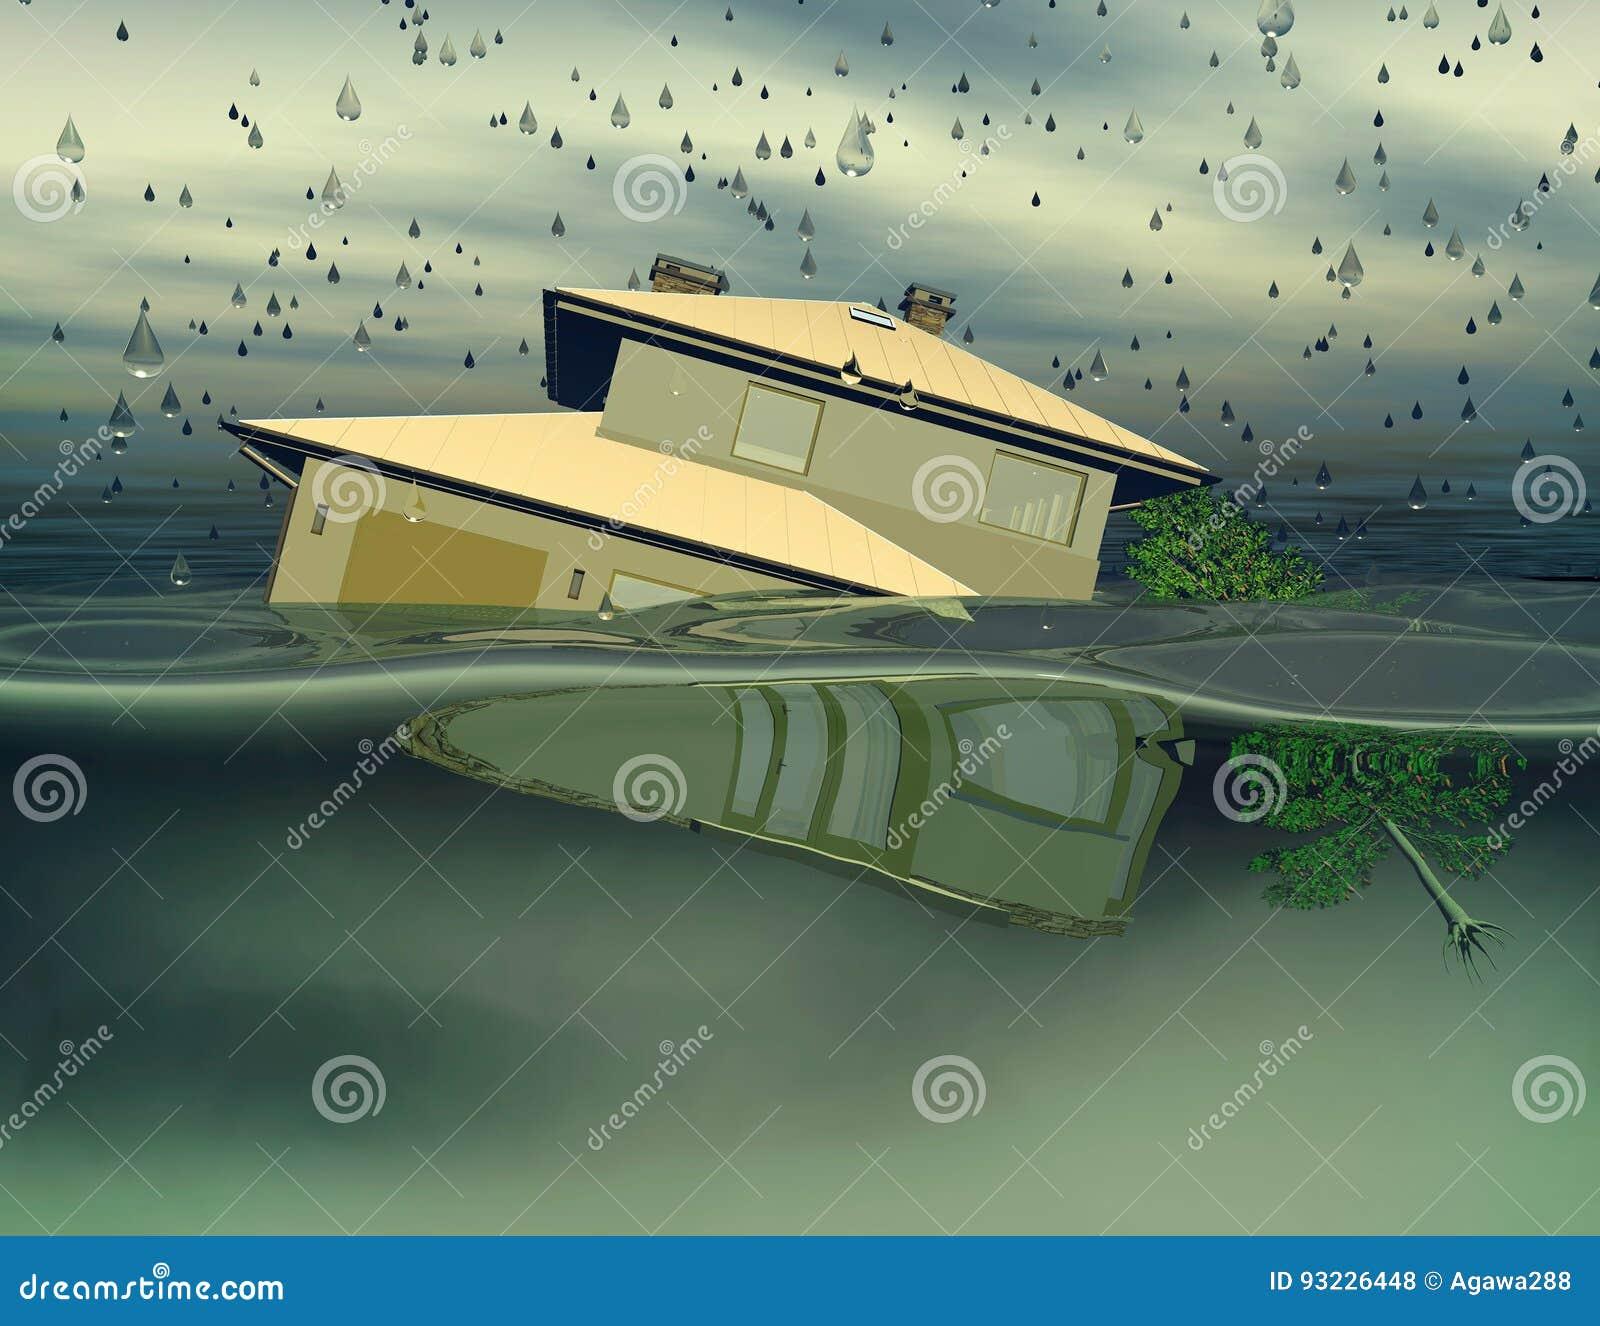 Flooded house under water 3D illustration.